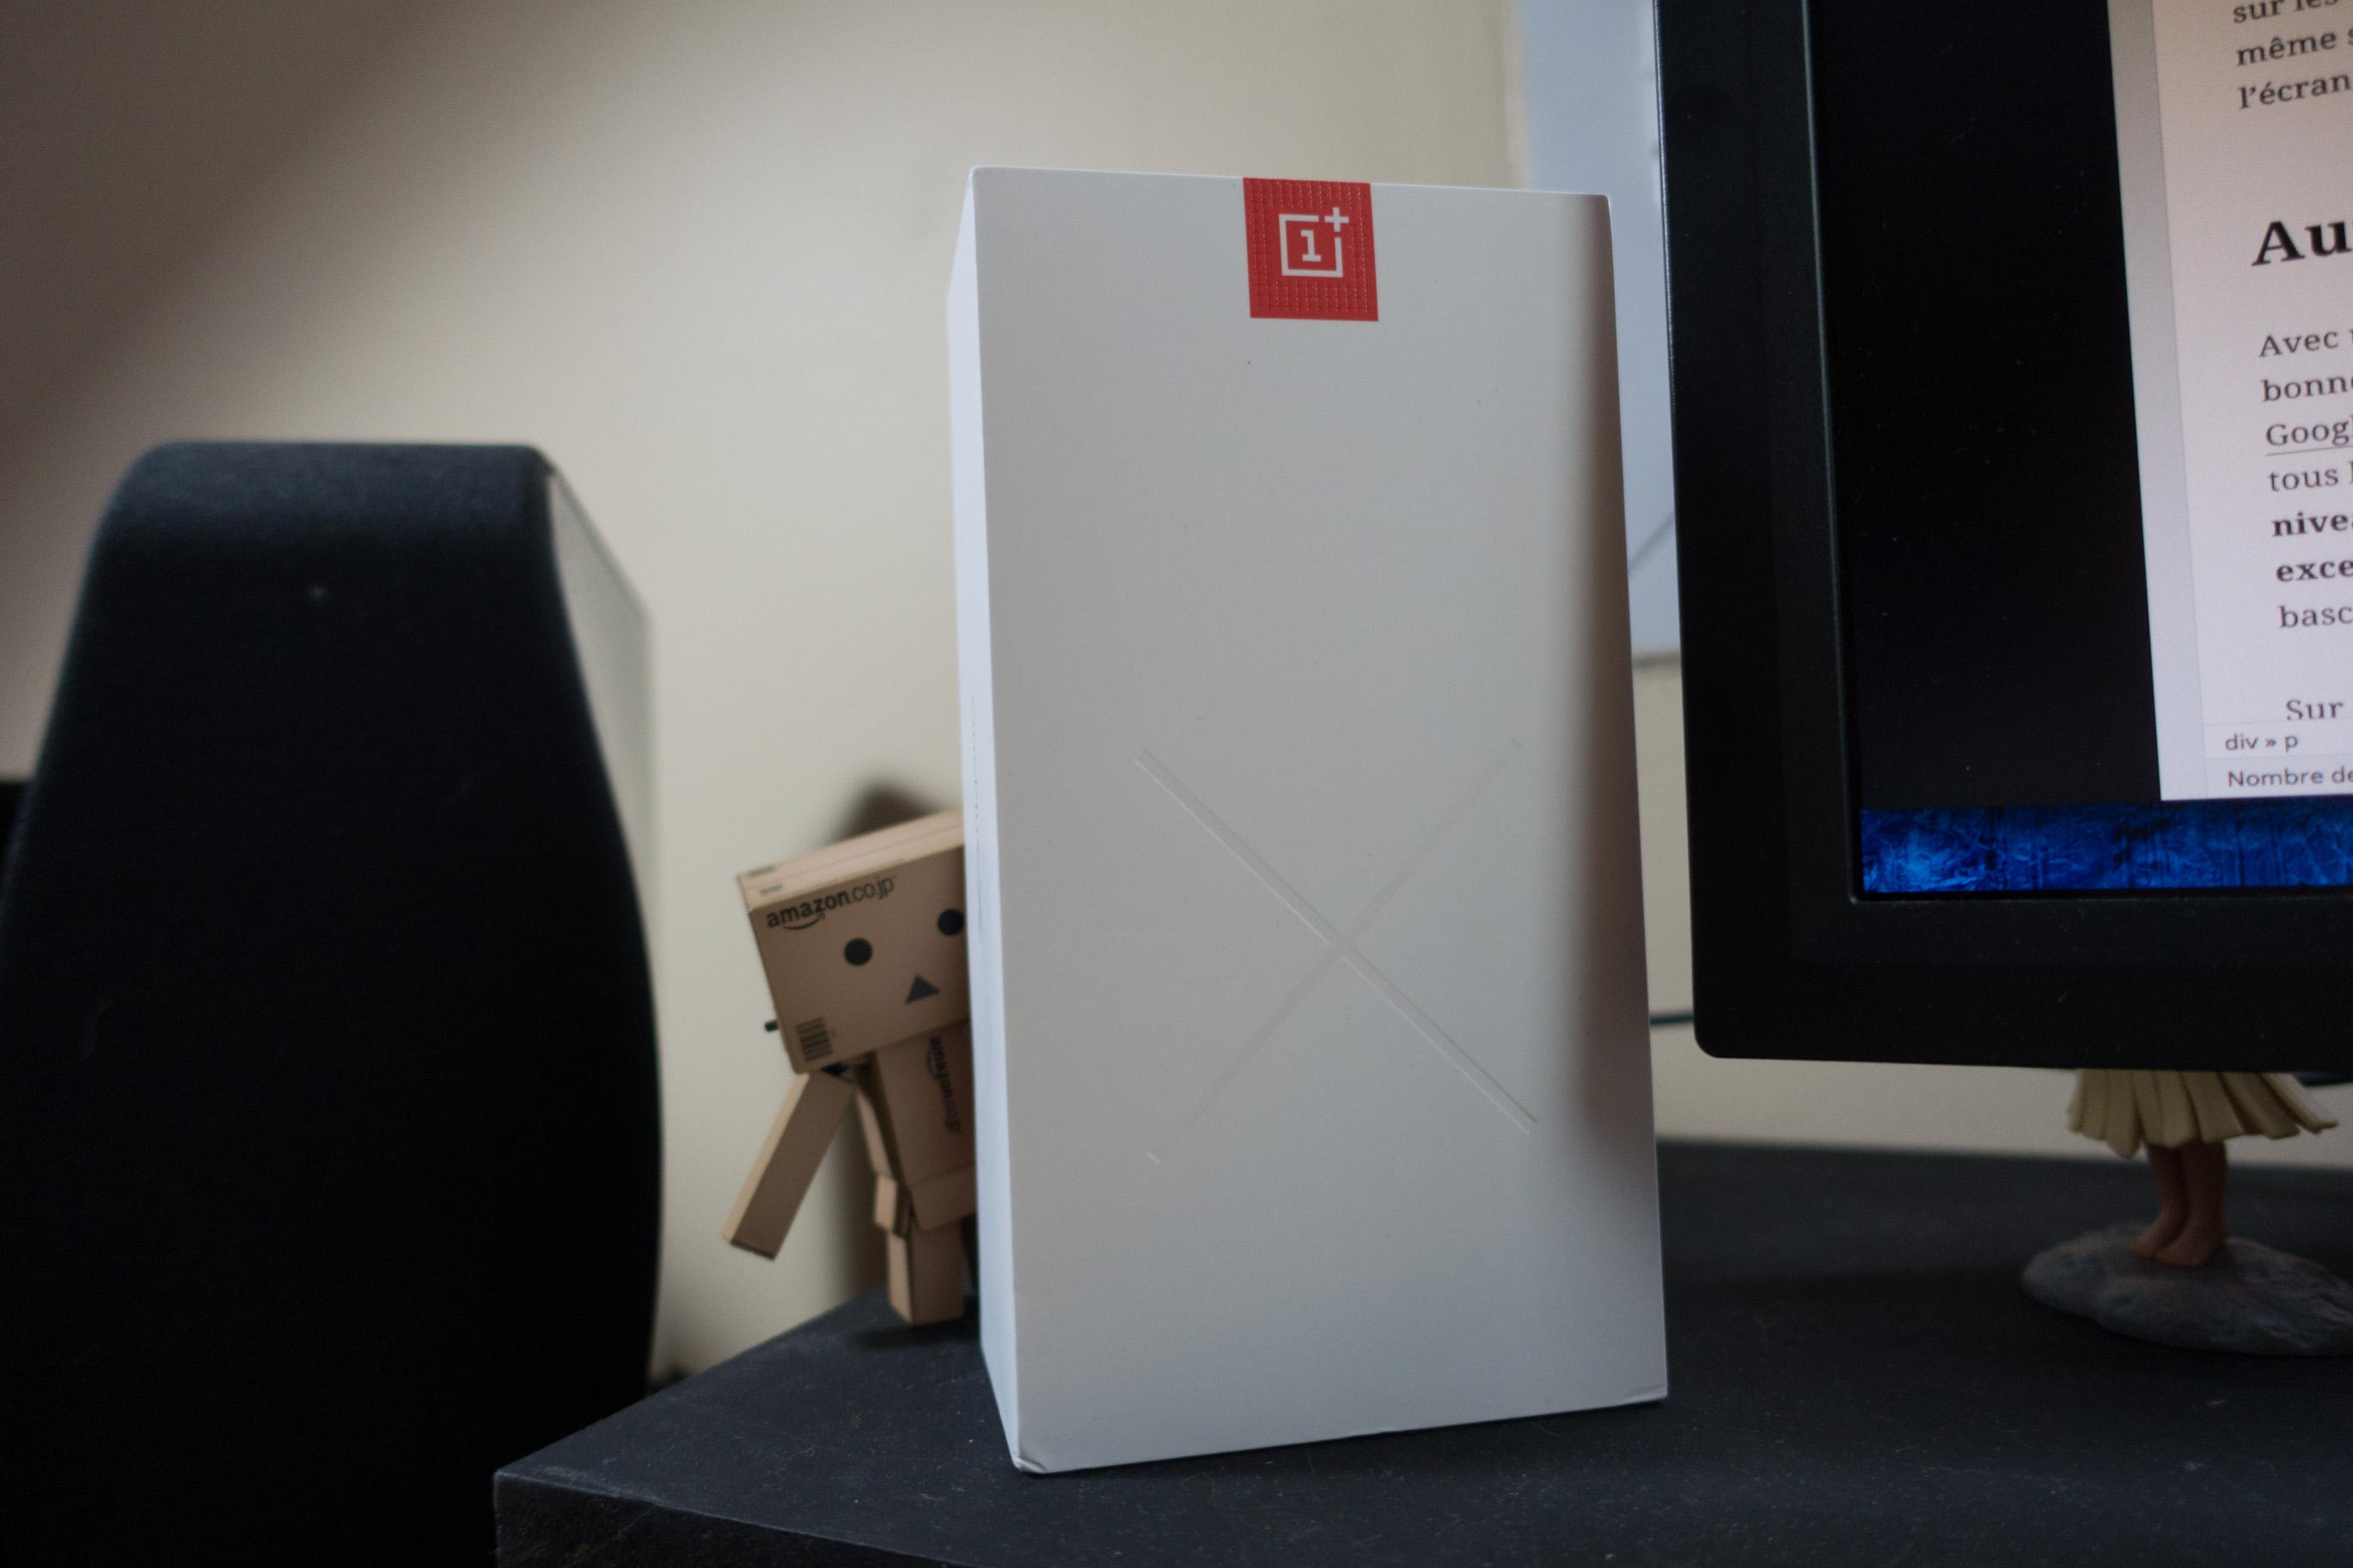 Unboxing du OnePlus X : bluffant